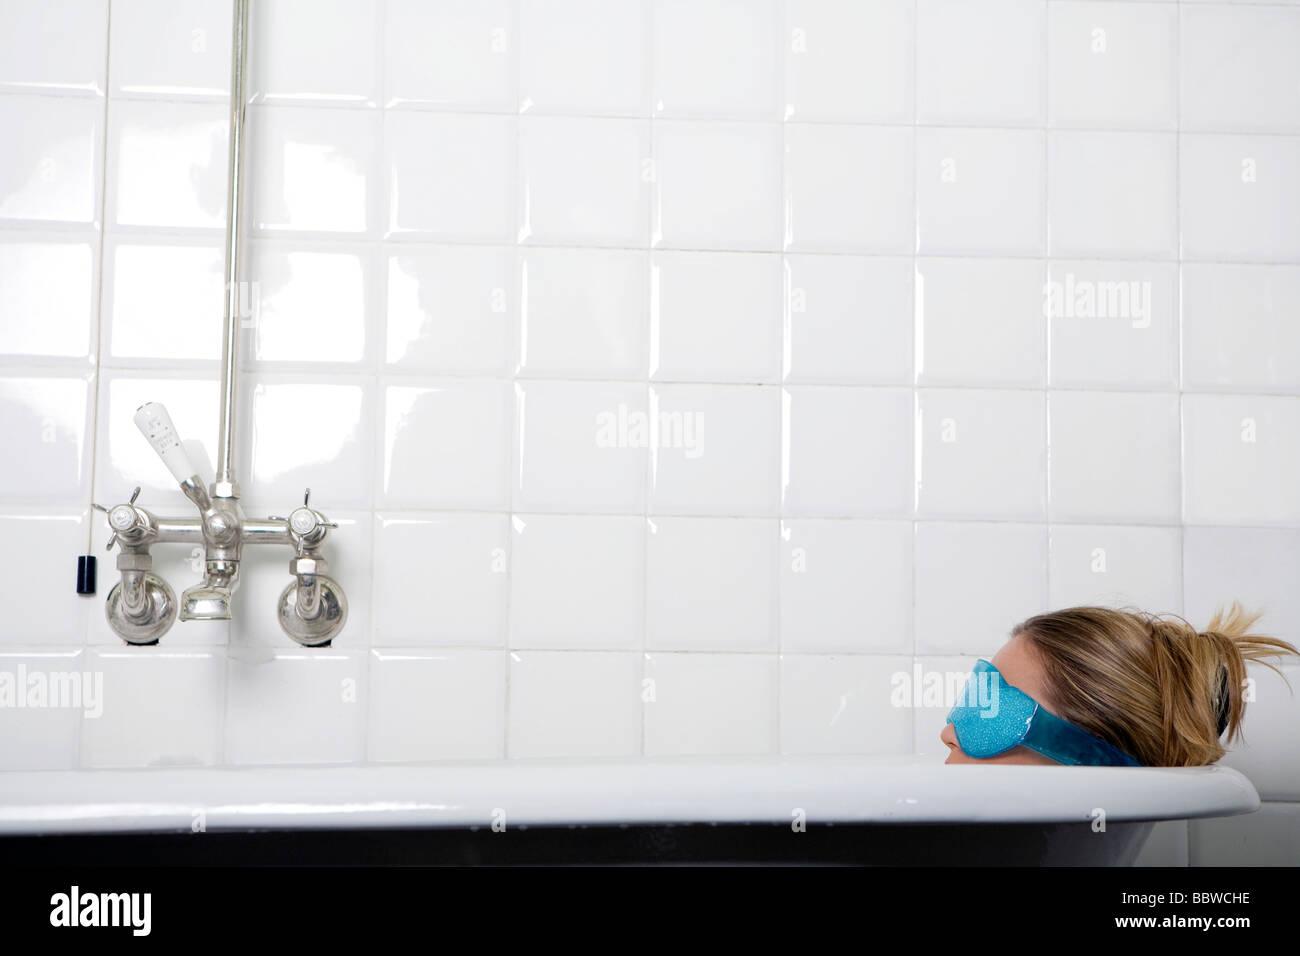 young woman in bathtub wearing an eye mask - Stock Image